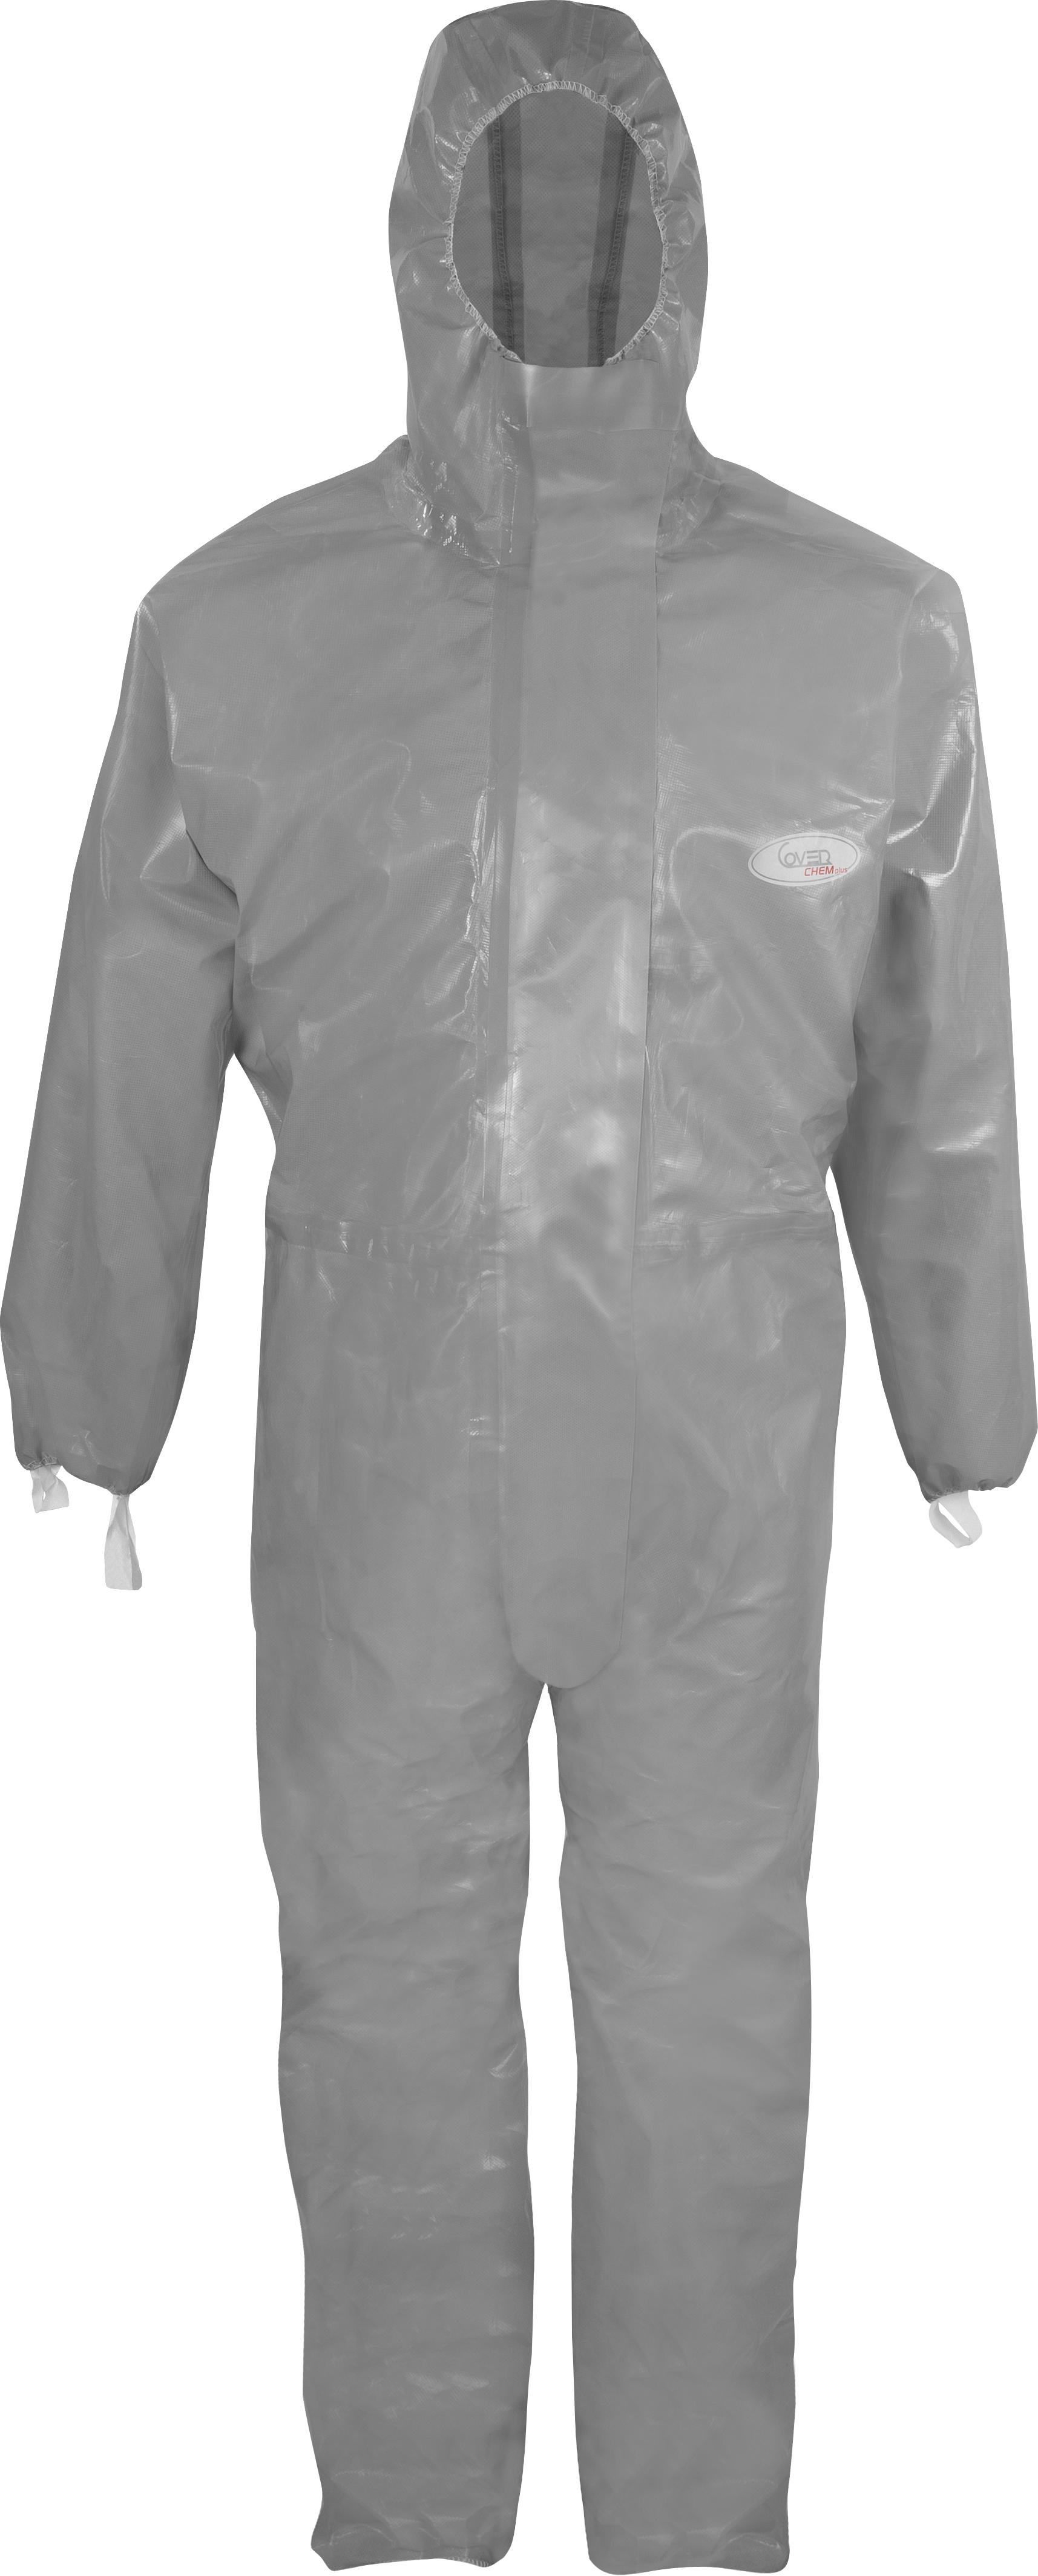 CoverChem Plus® Chemieschutzoverall, Kat. III Typ 3B - 6B